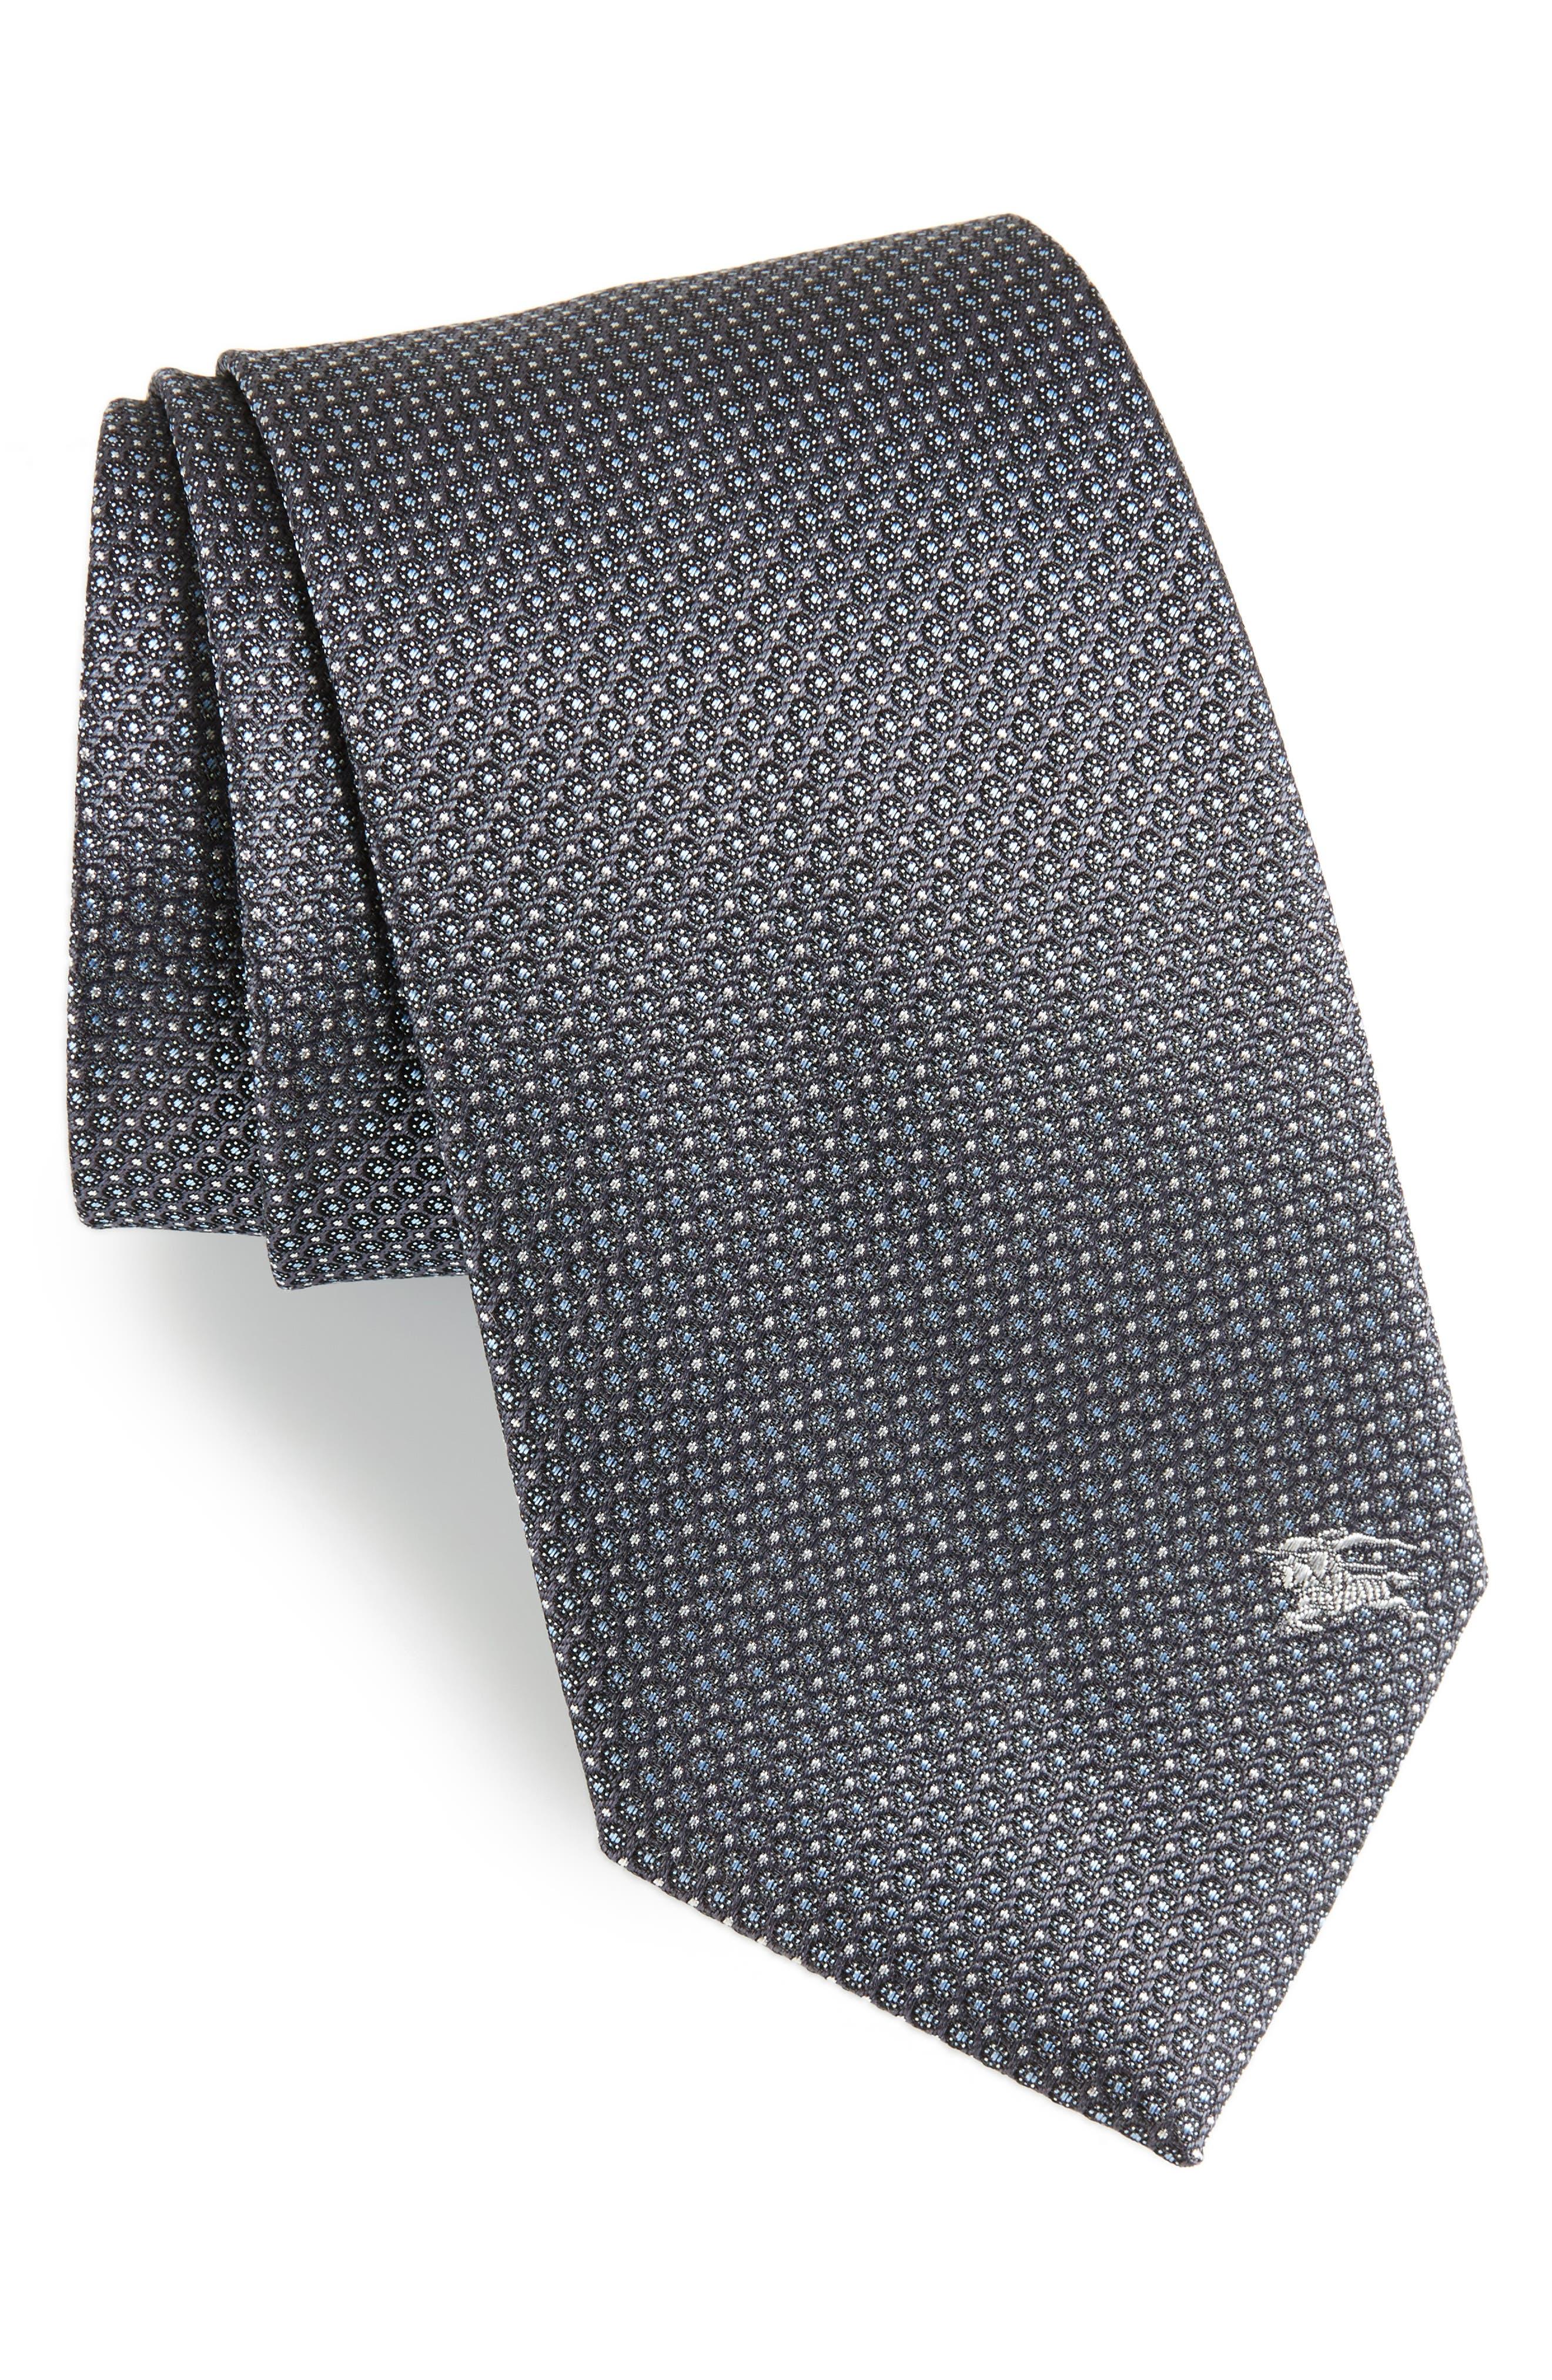 Clinton Silk Tie,                         Main,                         color, Charcoal